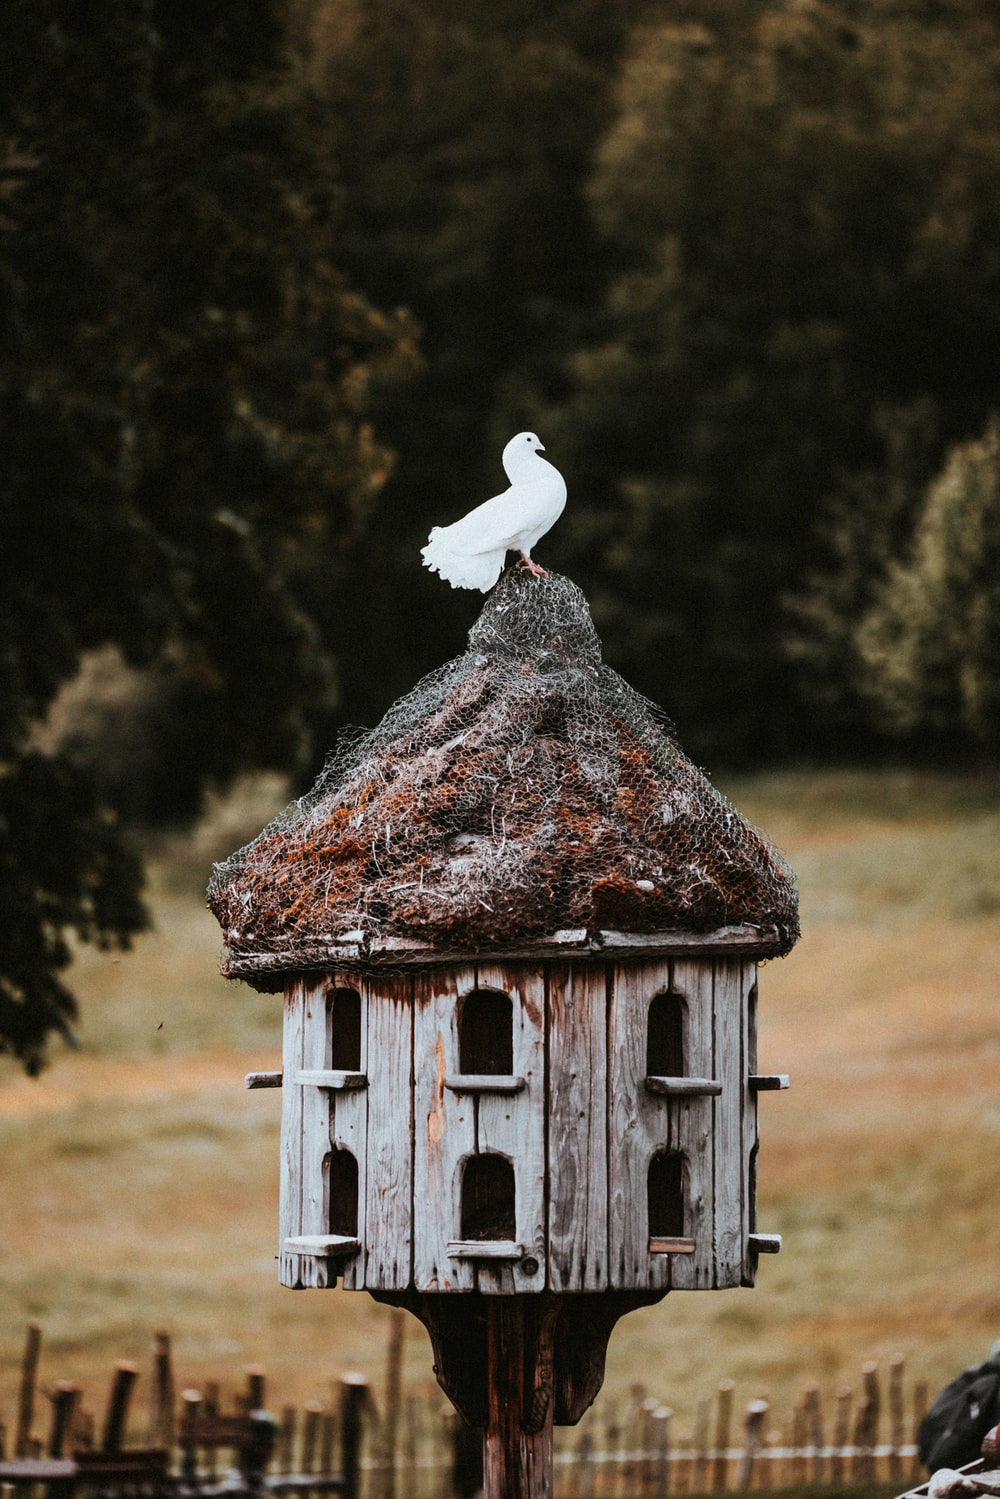 white bird flying over brown wooden bird house during daytime